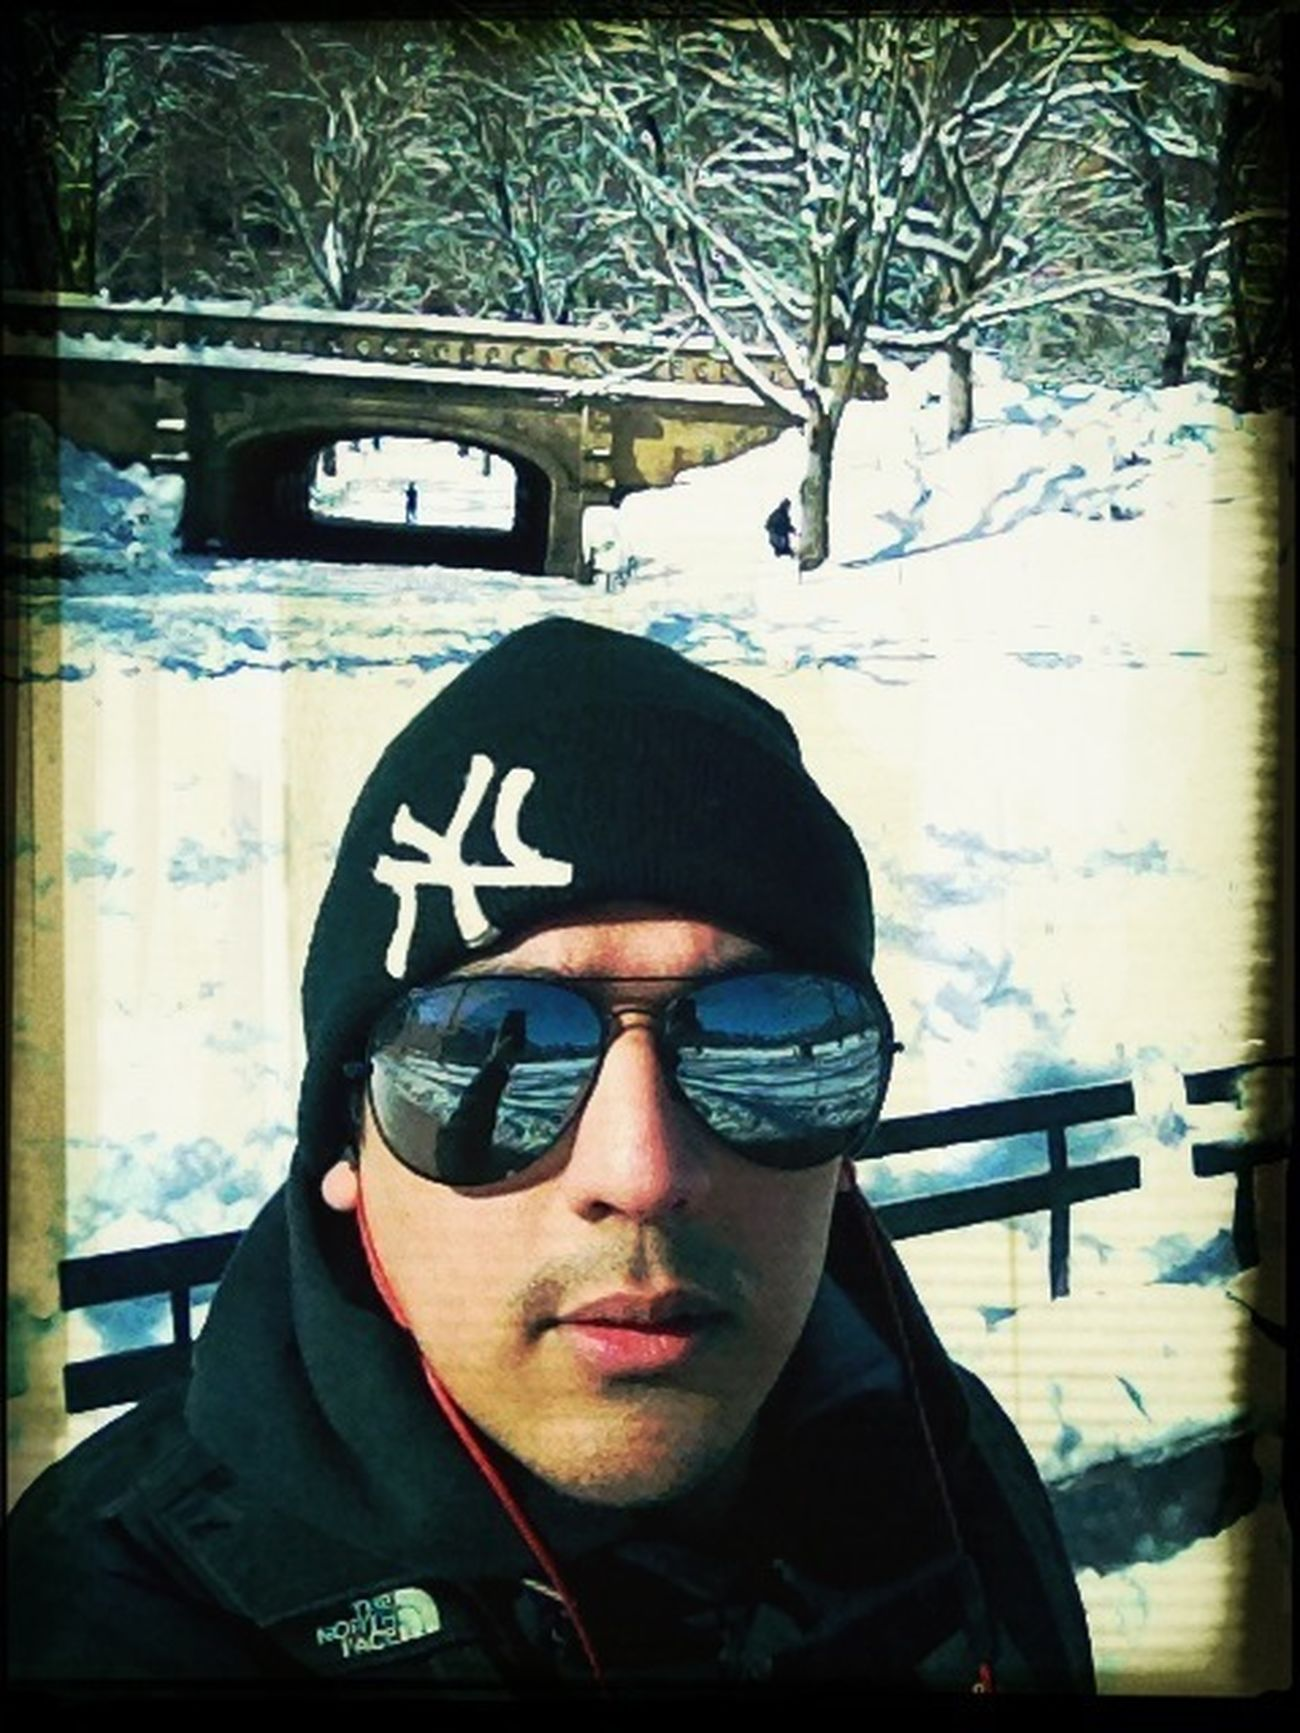 Winterbliss